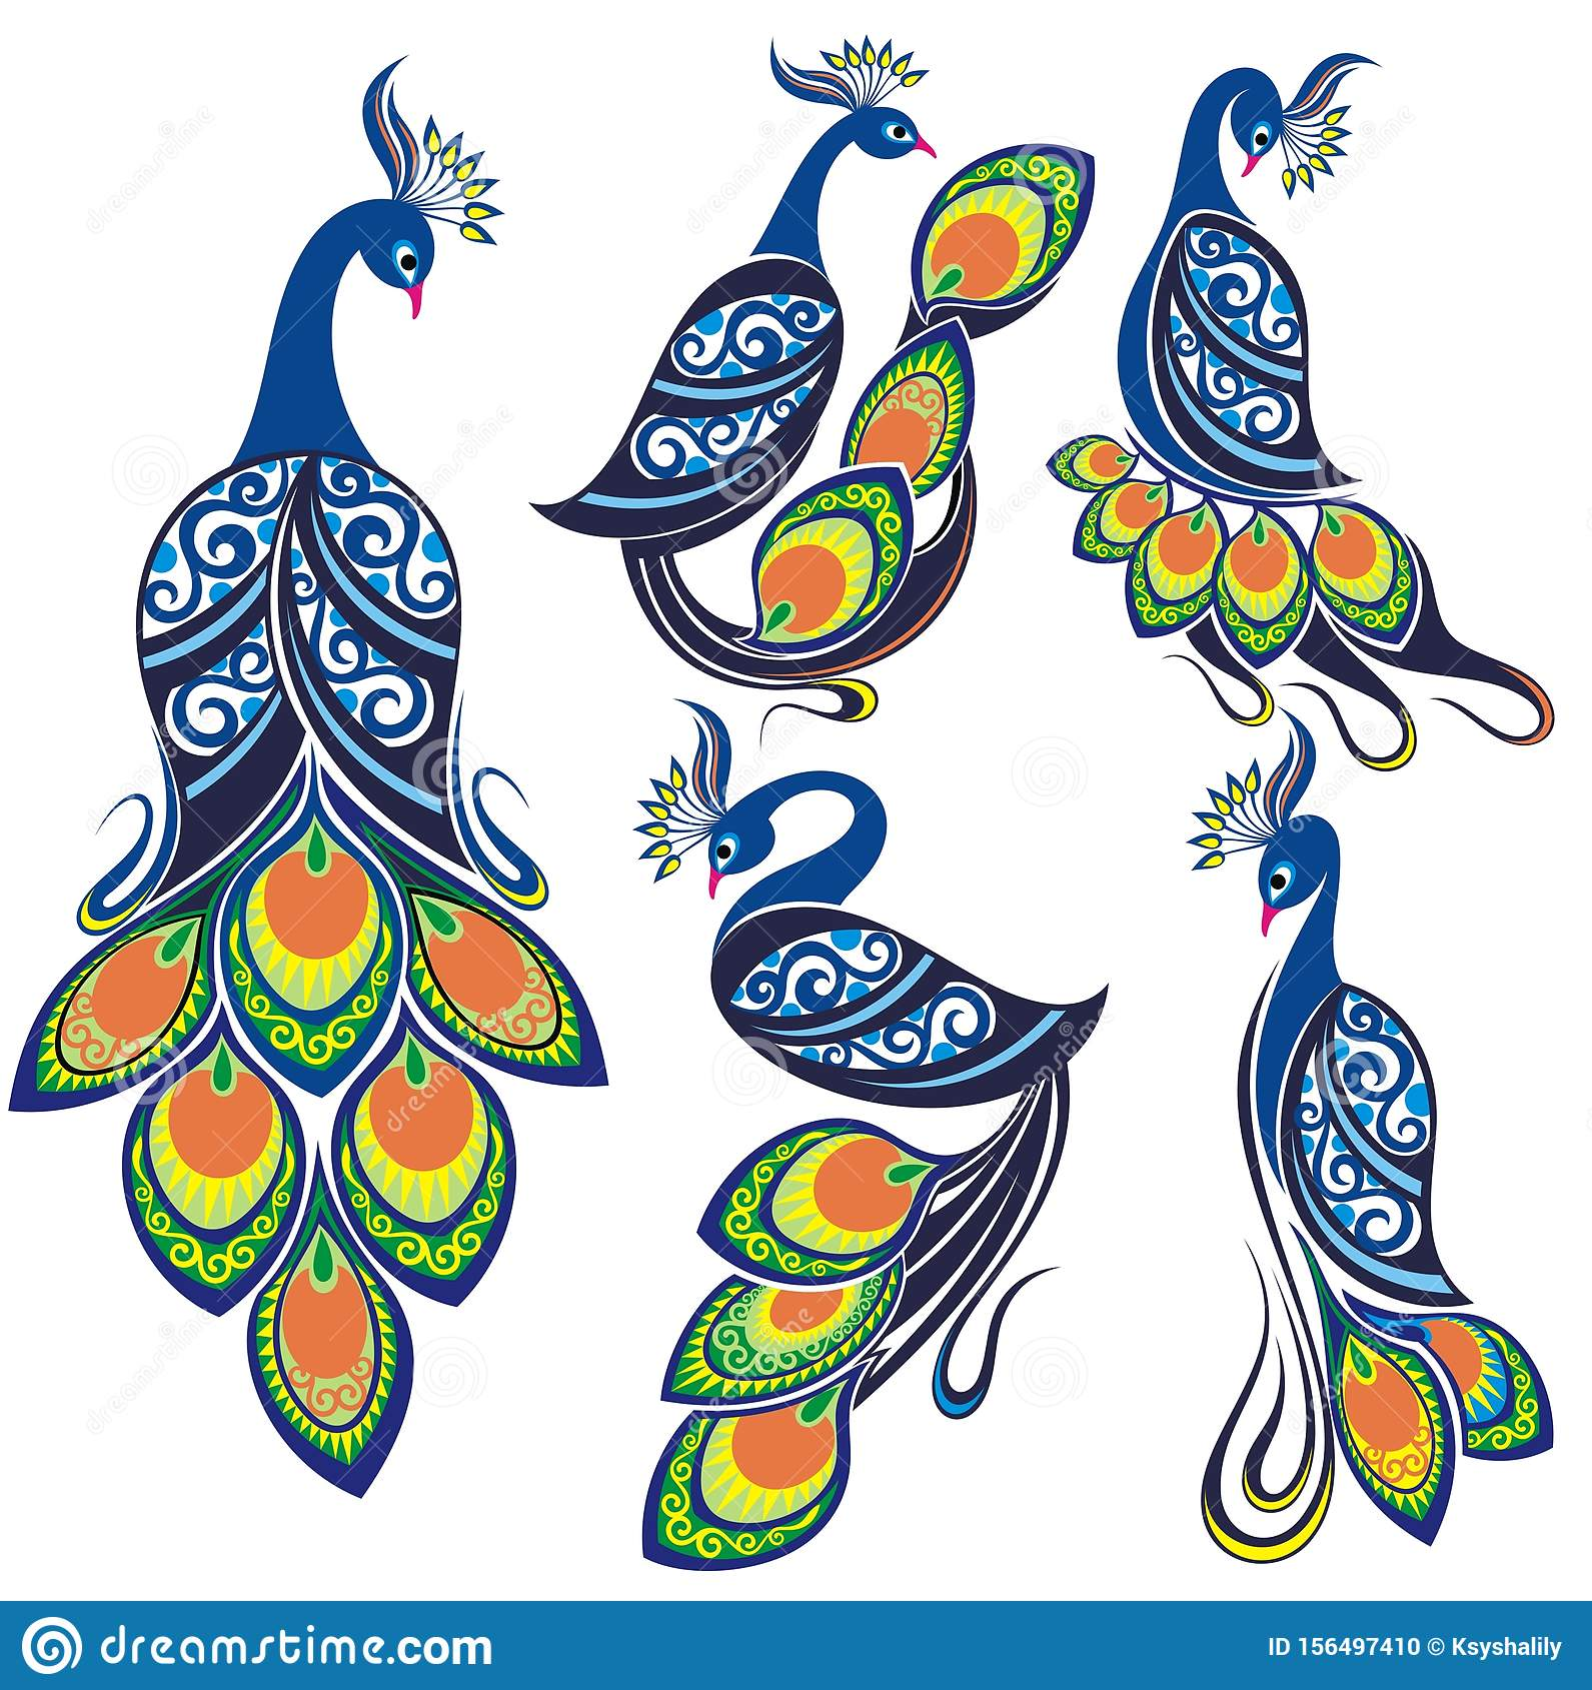 Peacocks. Peacock Vector Set. Bird Logo Stock Vector - Illustration of isolated. cartoon: 156497410